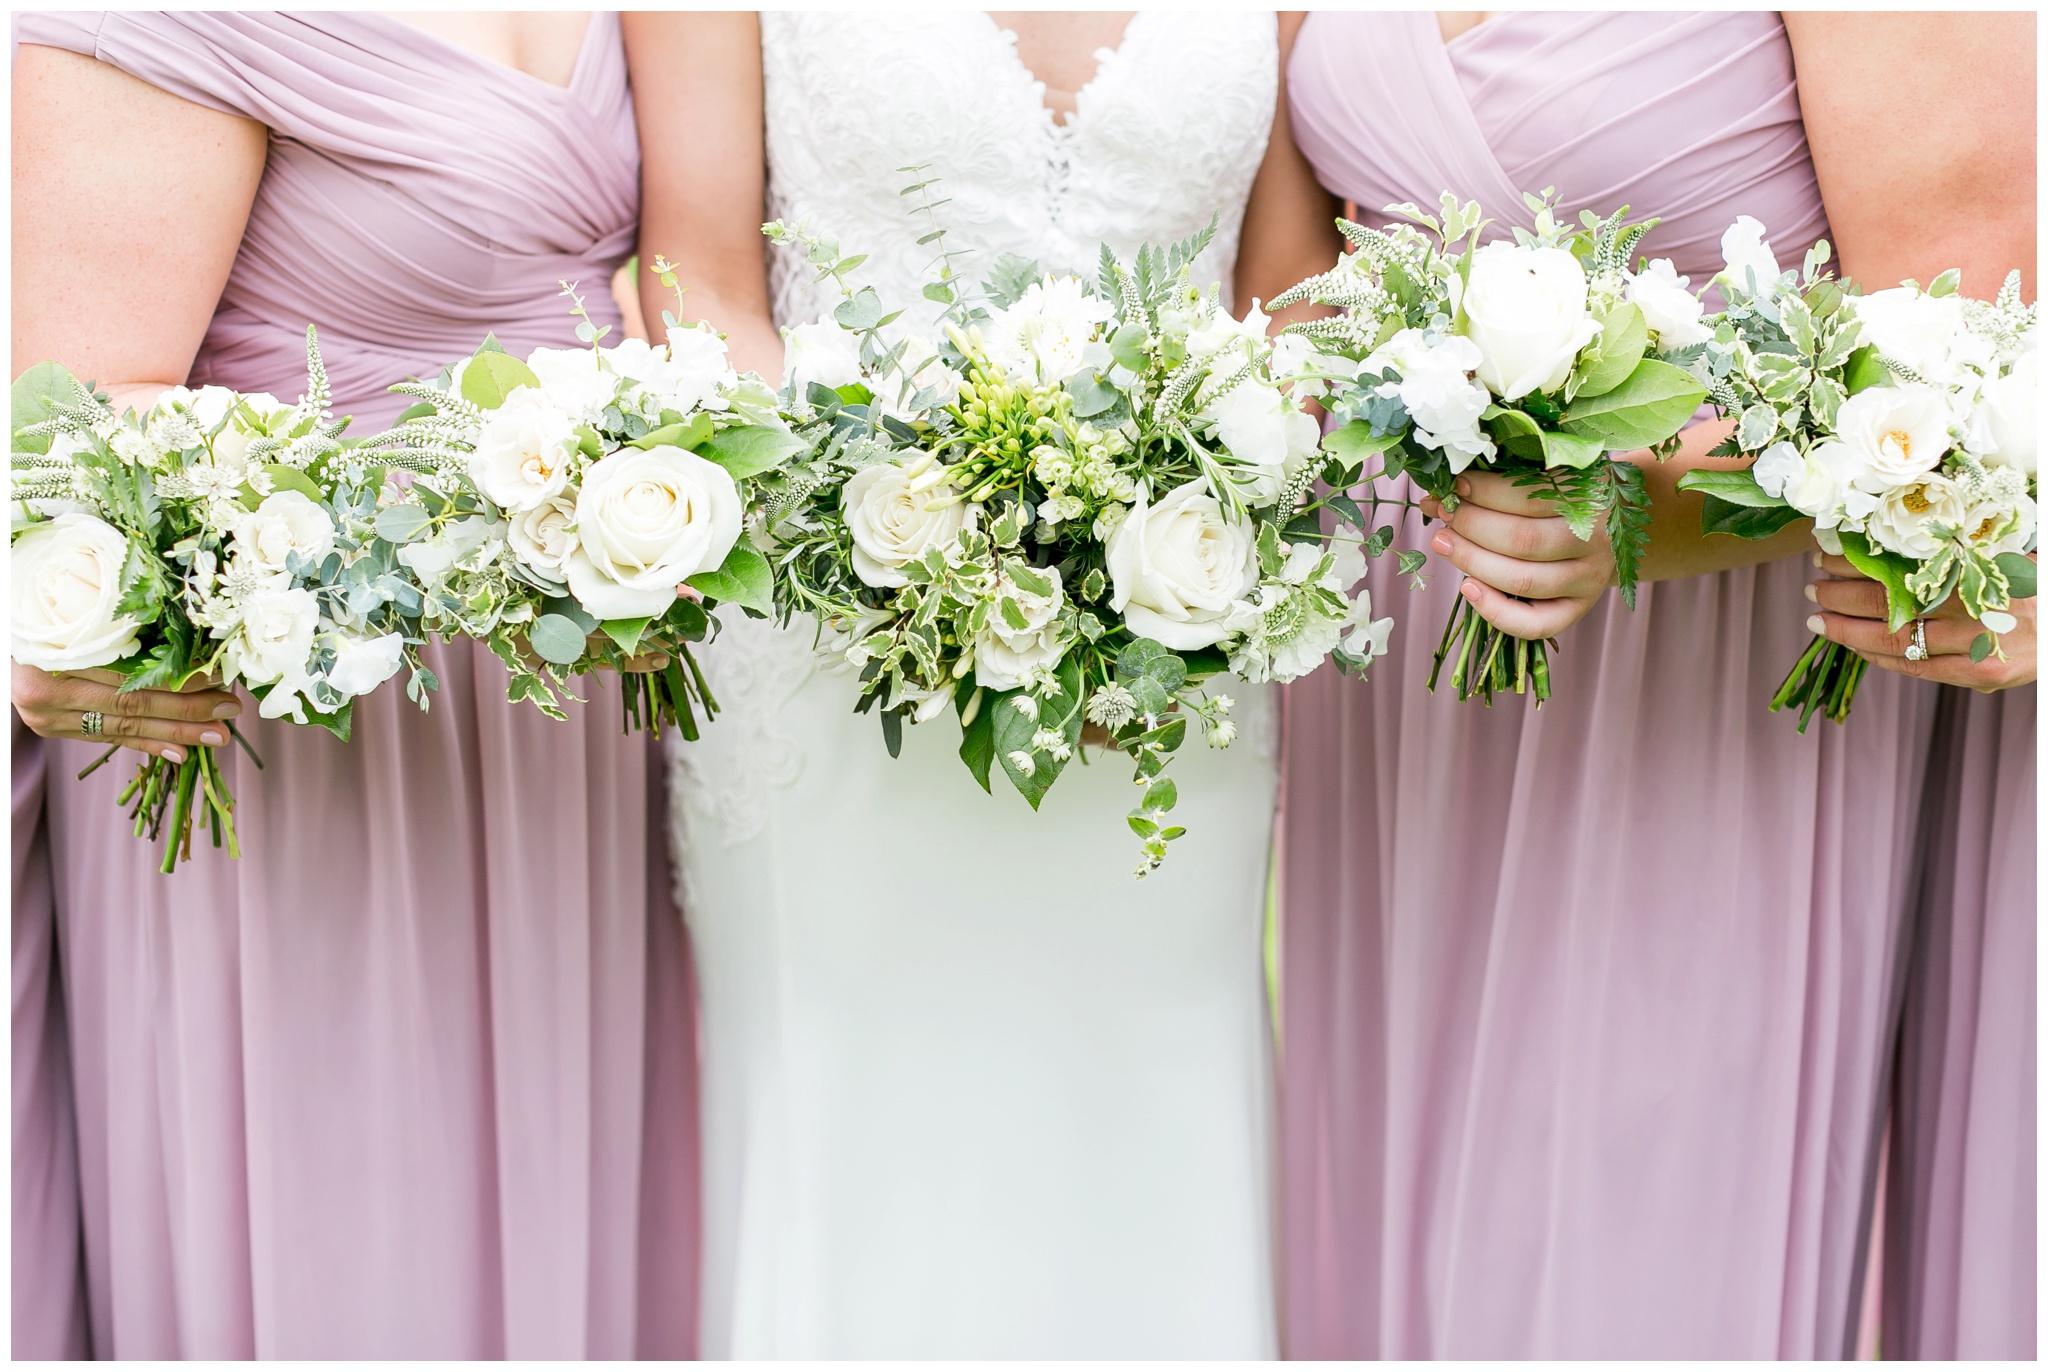 Union_south_Wedding_Madison_Wisconsin_Caynay_Photo_3668.jpg